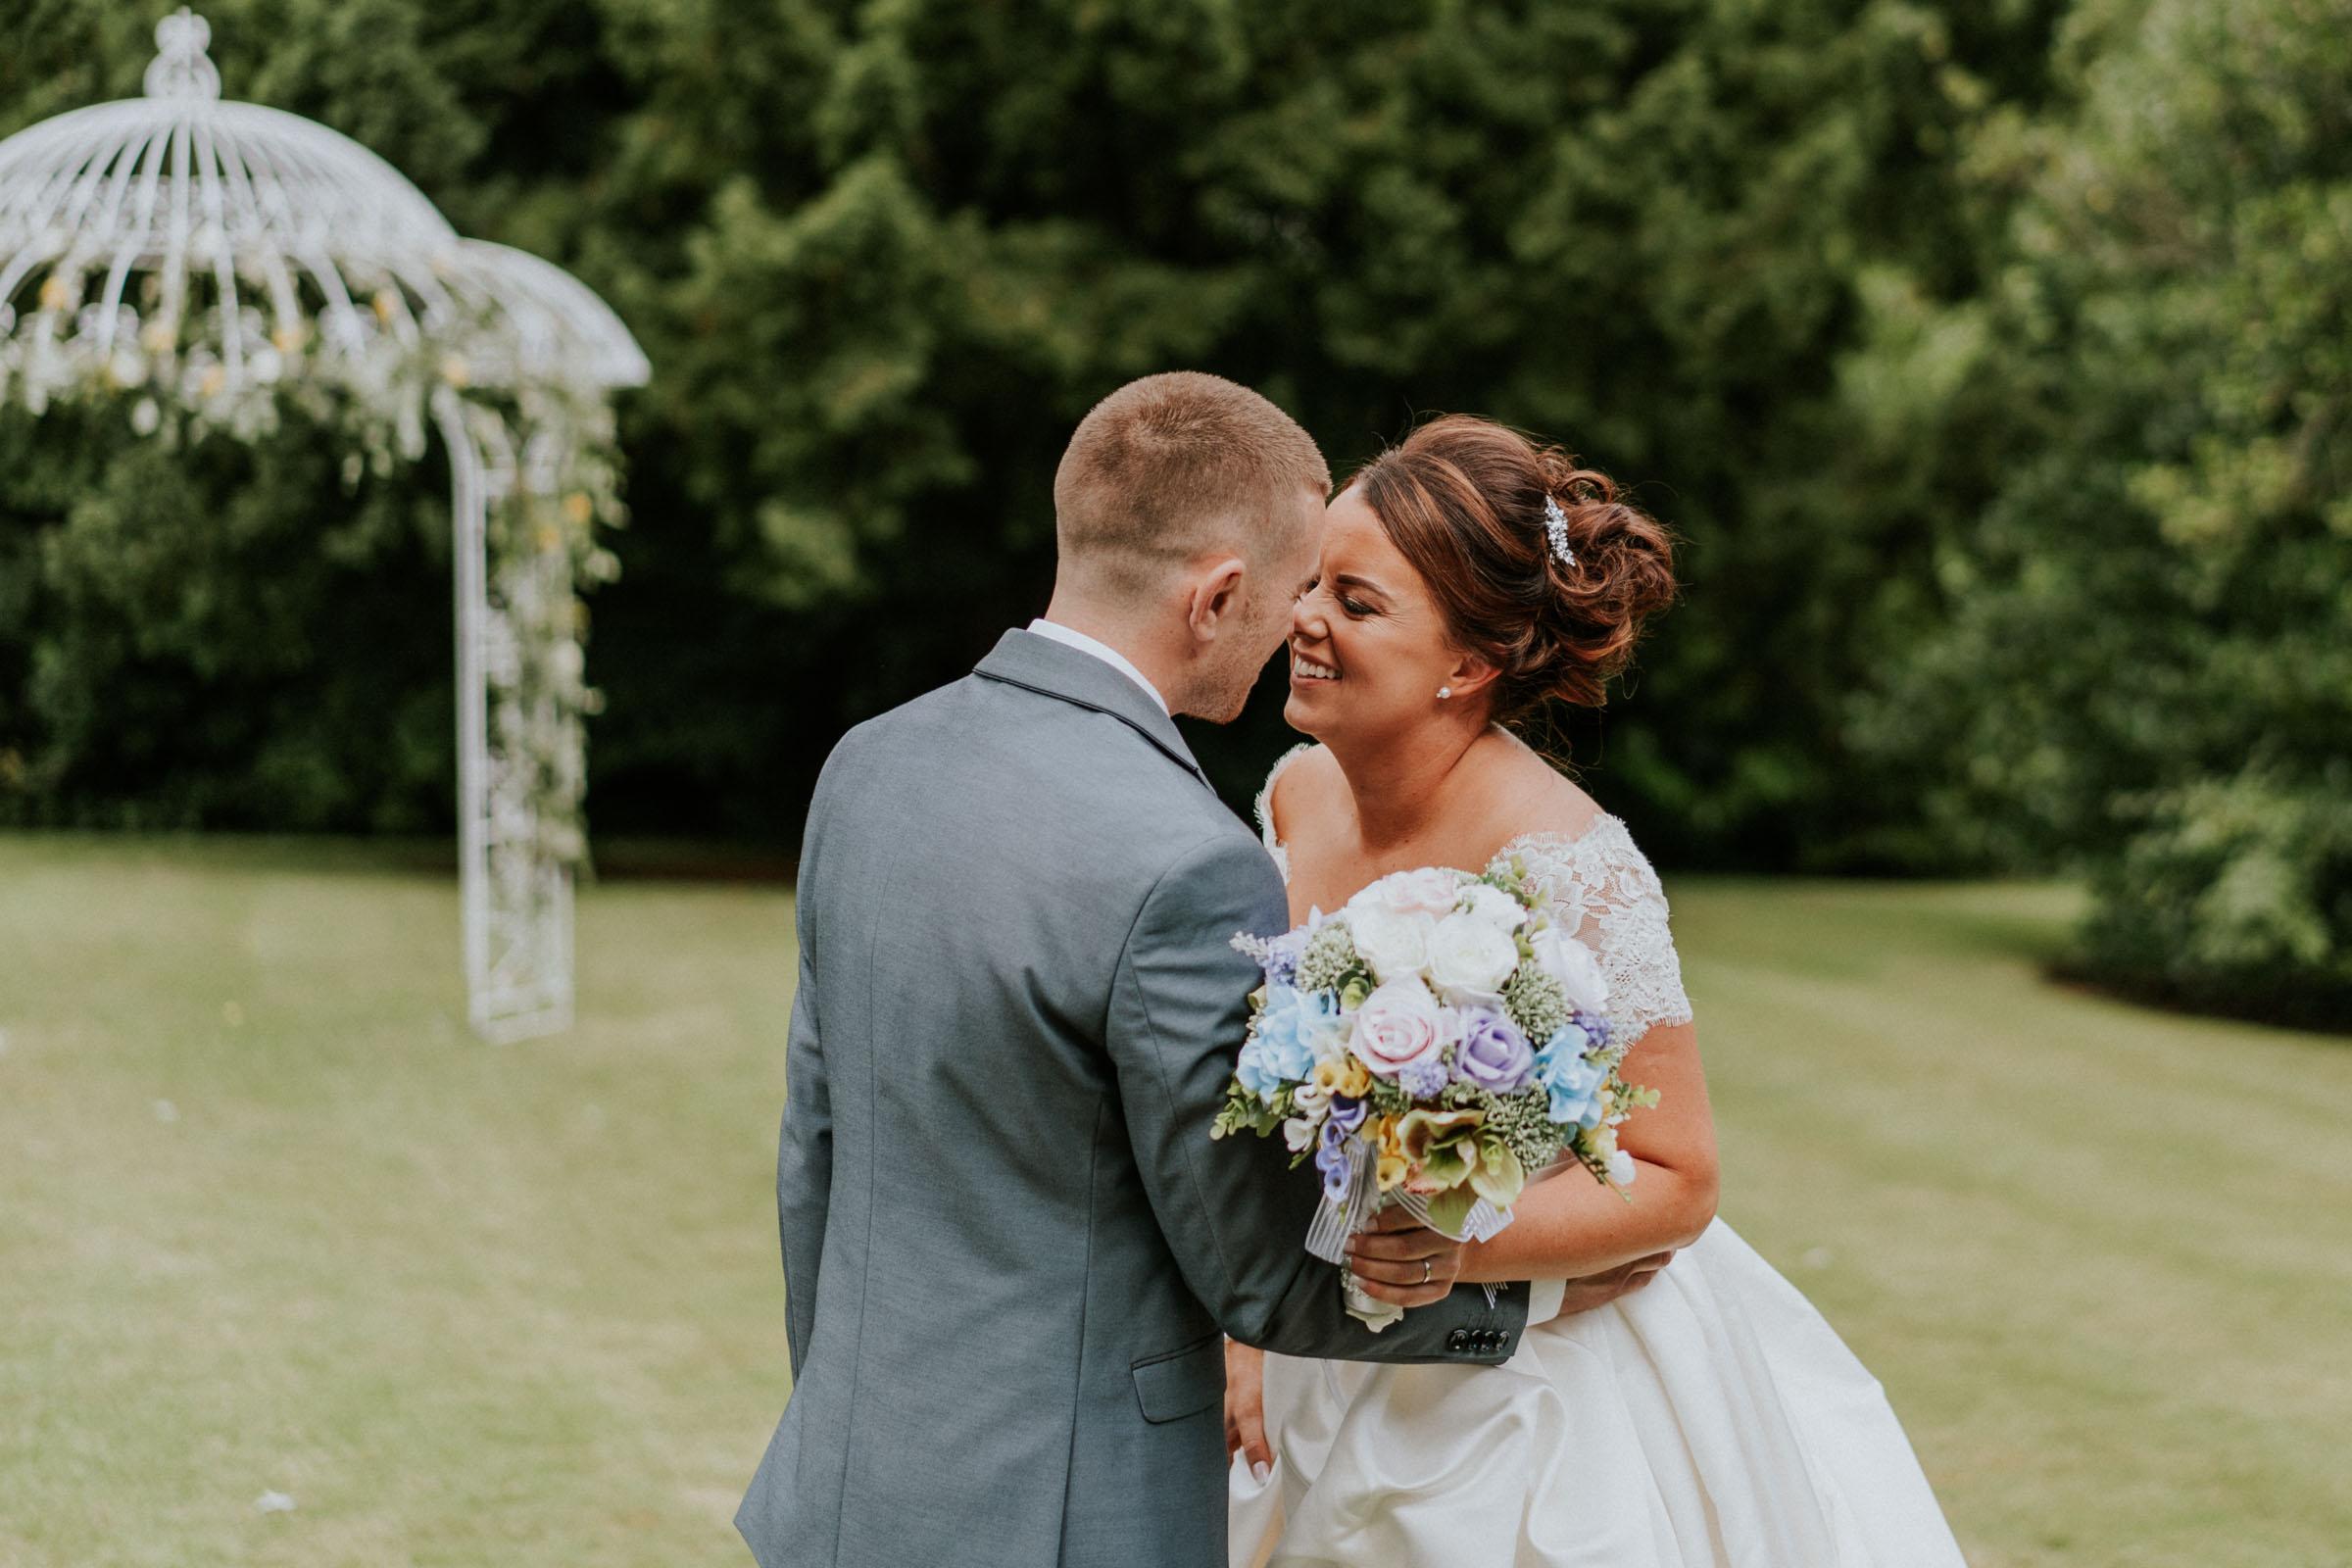 Dalmeny-Park-Glasgow-Wedding-Dearly-Photography-Scotland (29 of 75).jpg